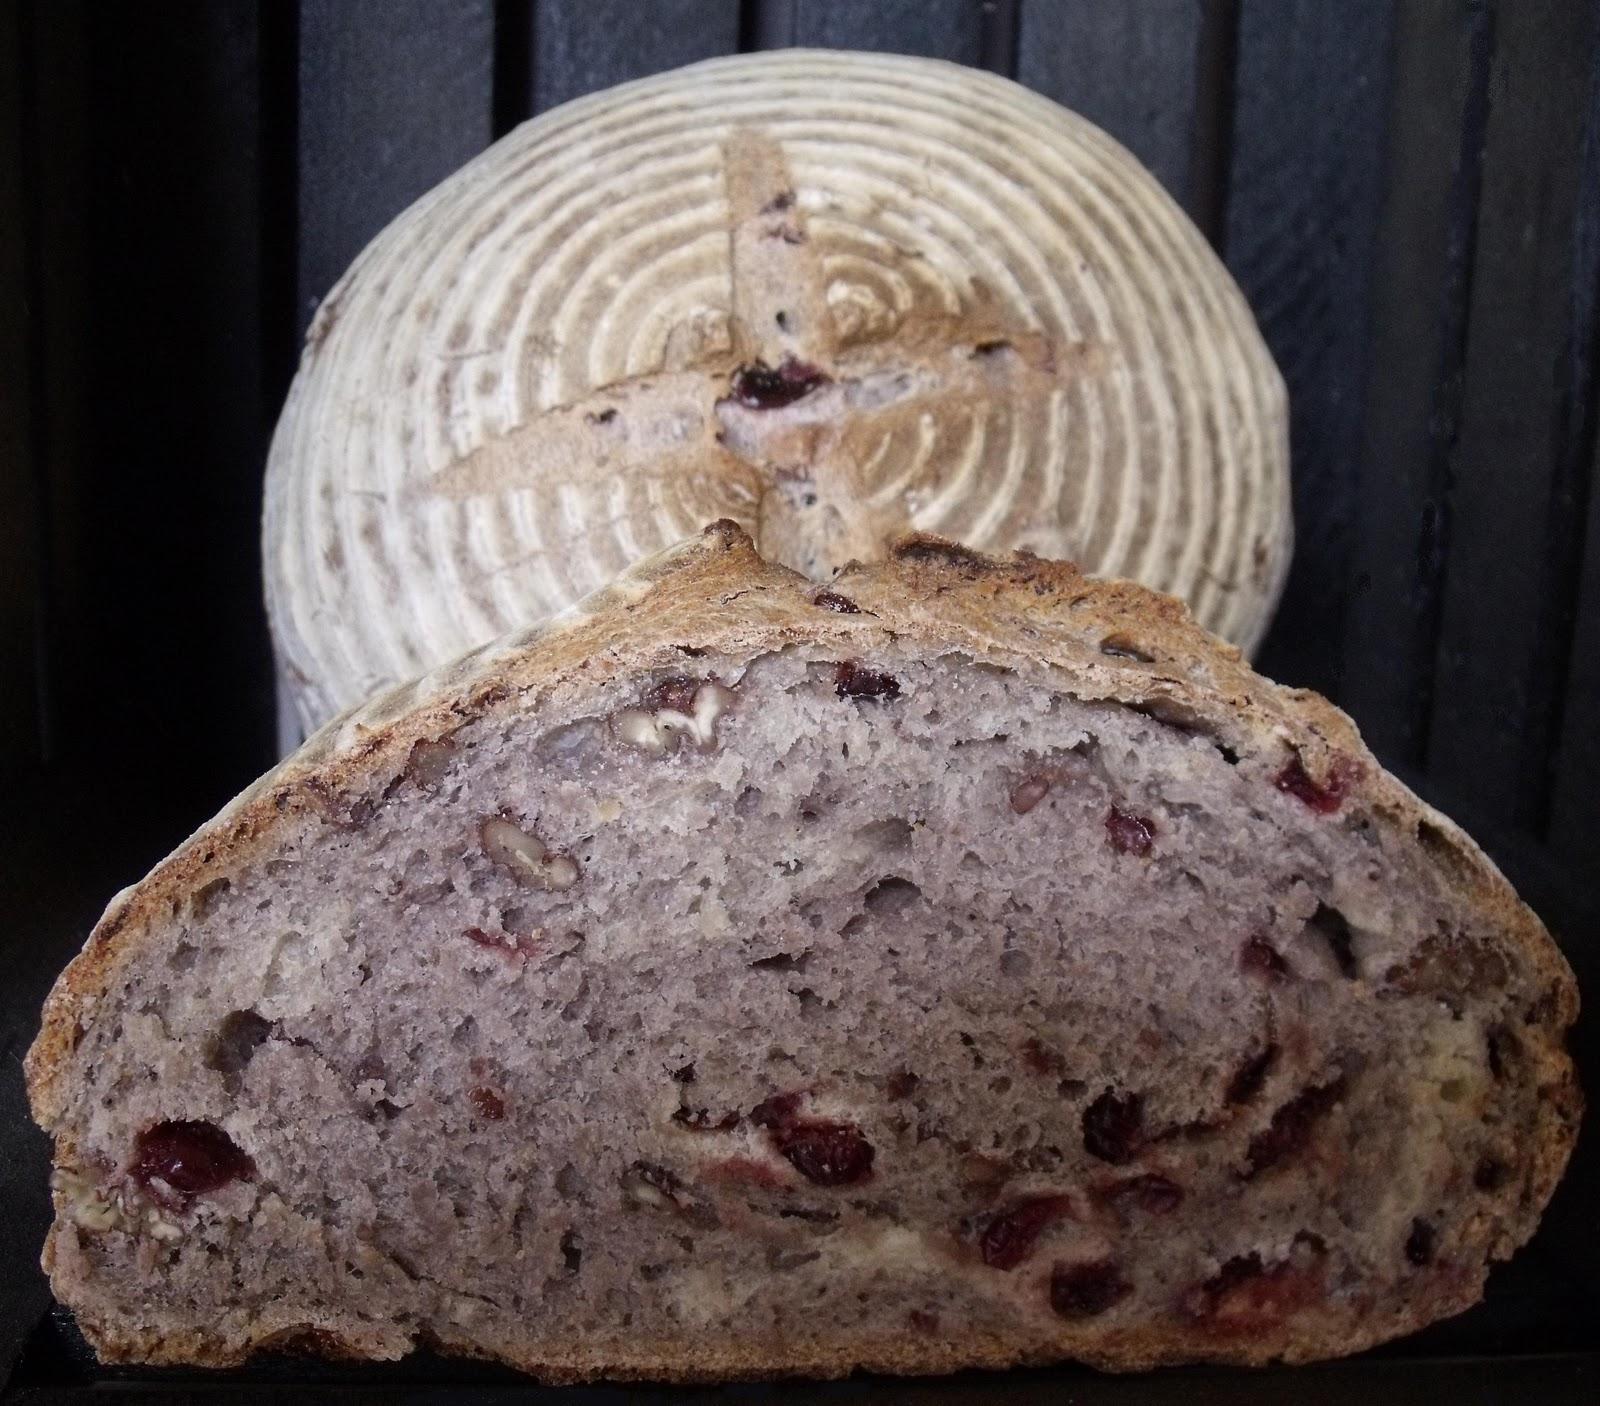 Overnight Rye Bread Recipe